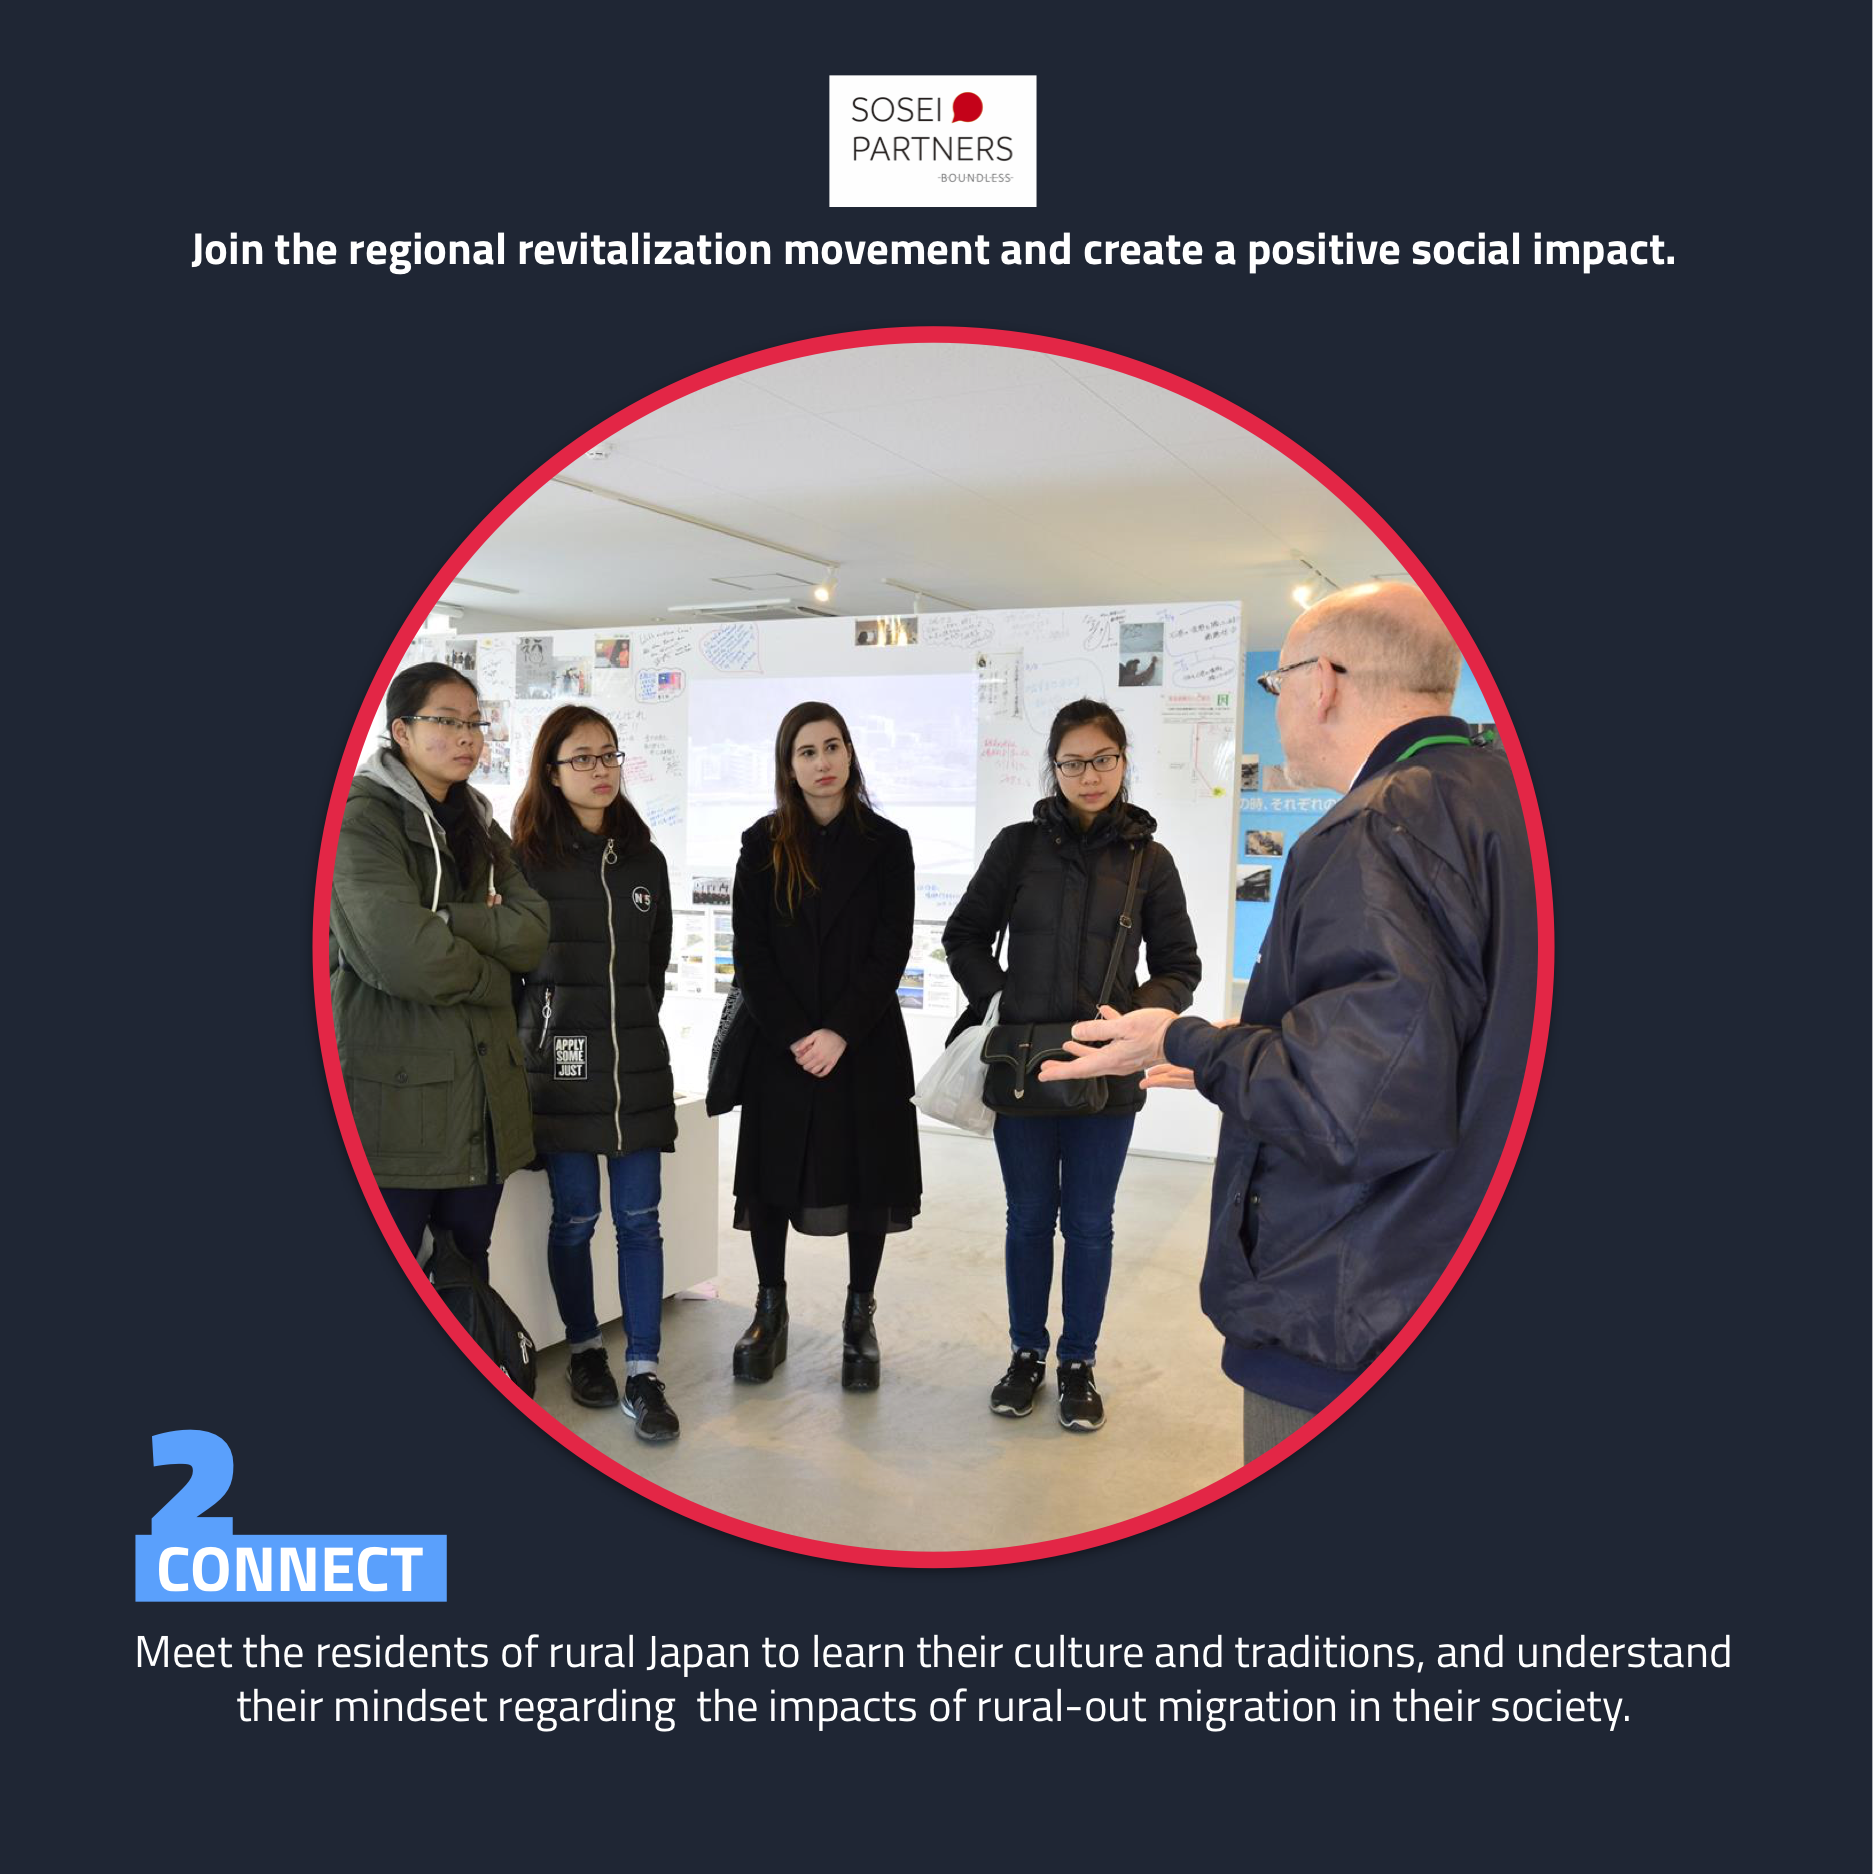 Sosei Partners FB Group Invite 2-2.png